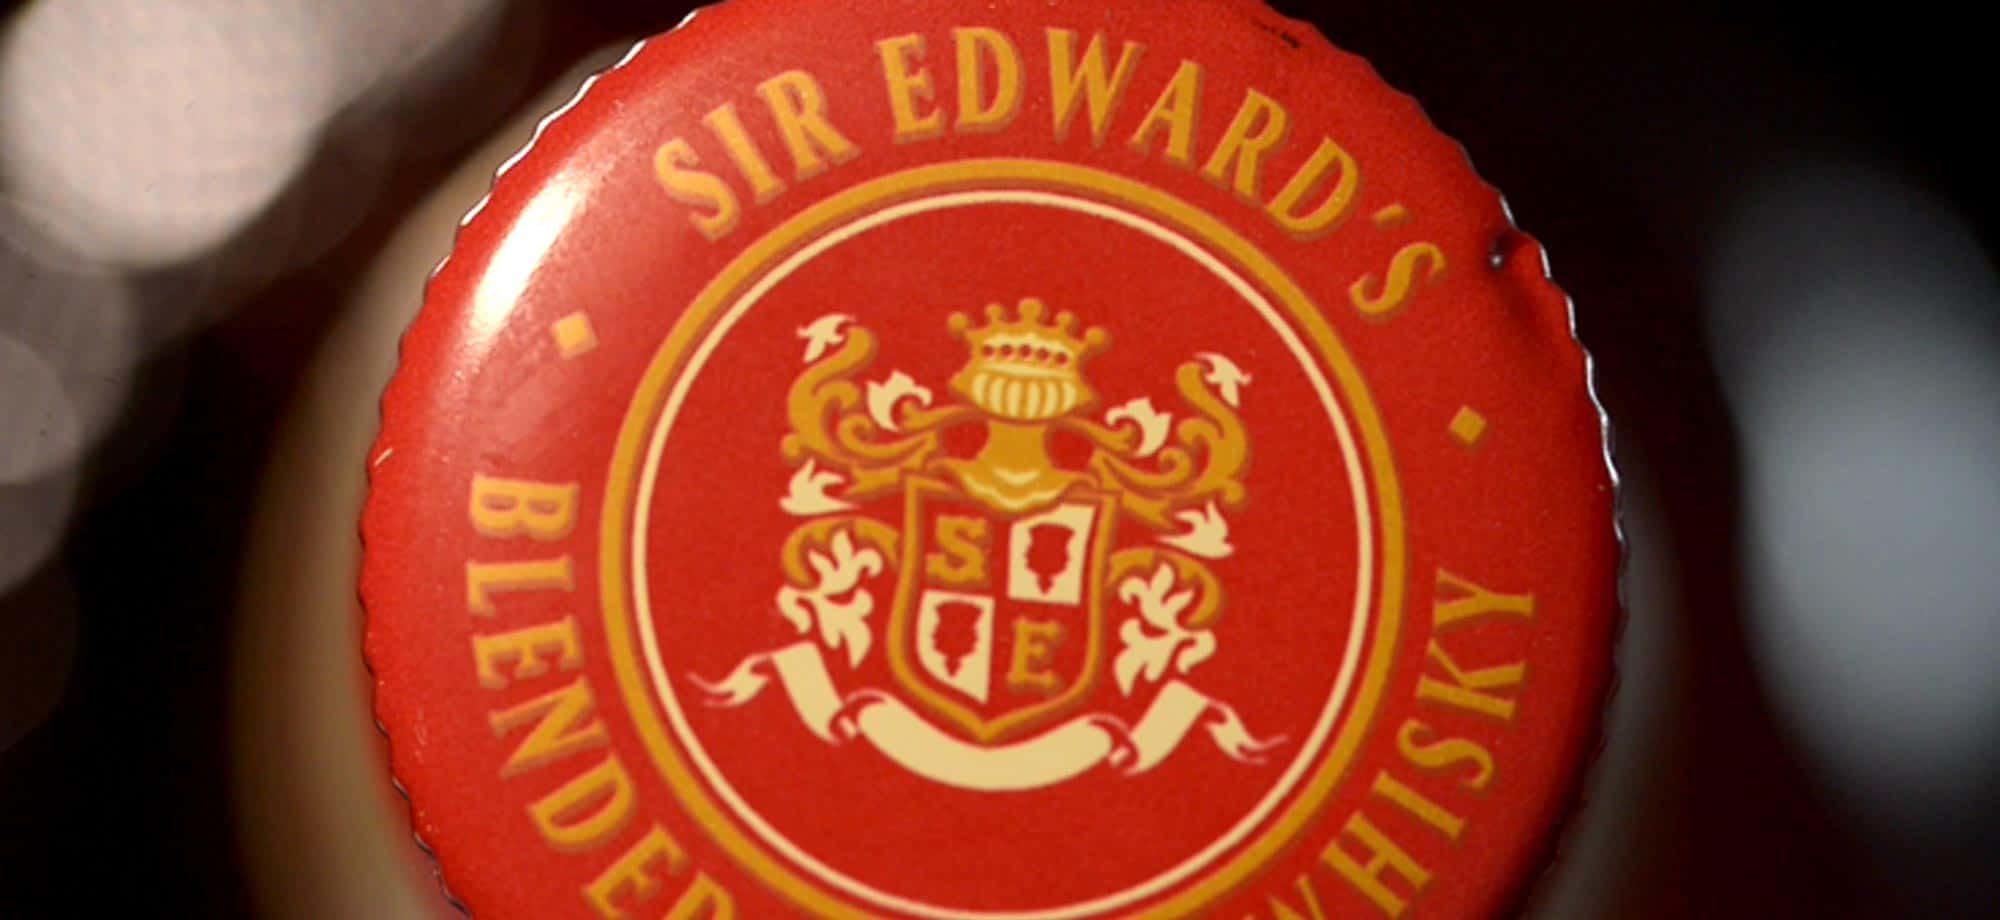 Sir Edward's origins